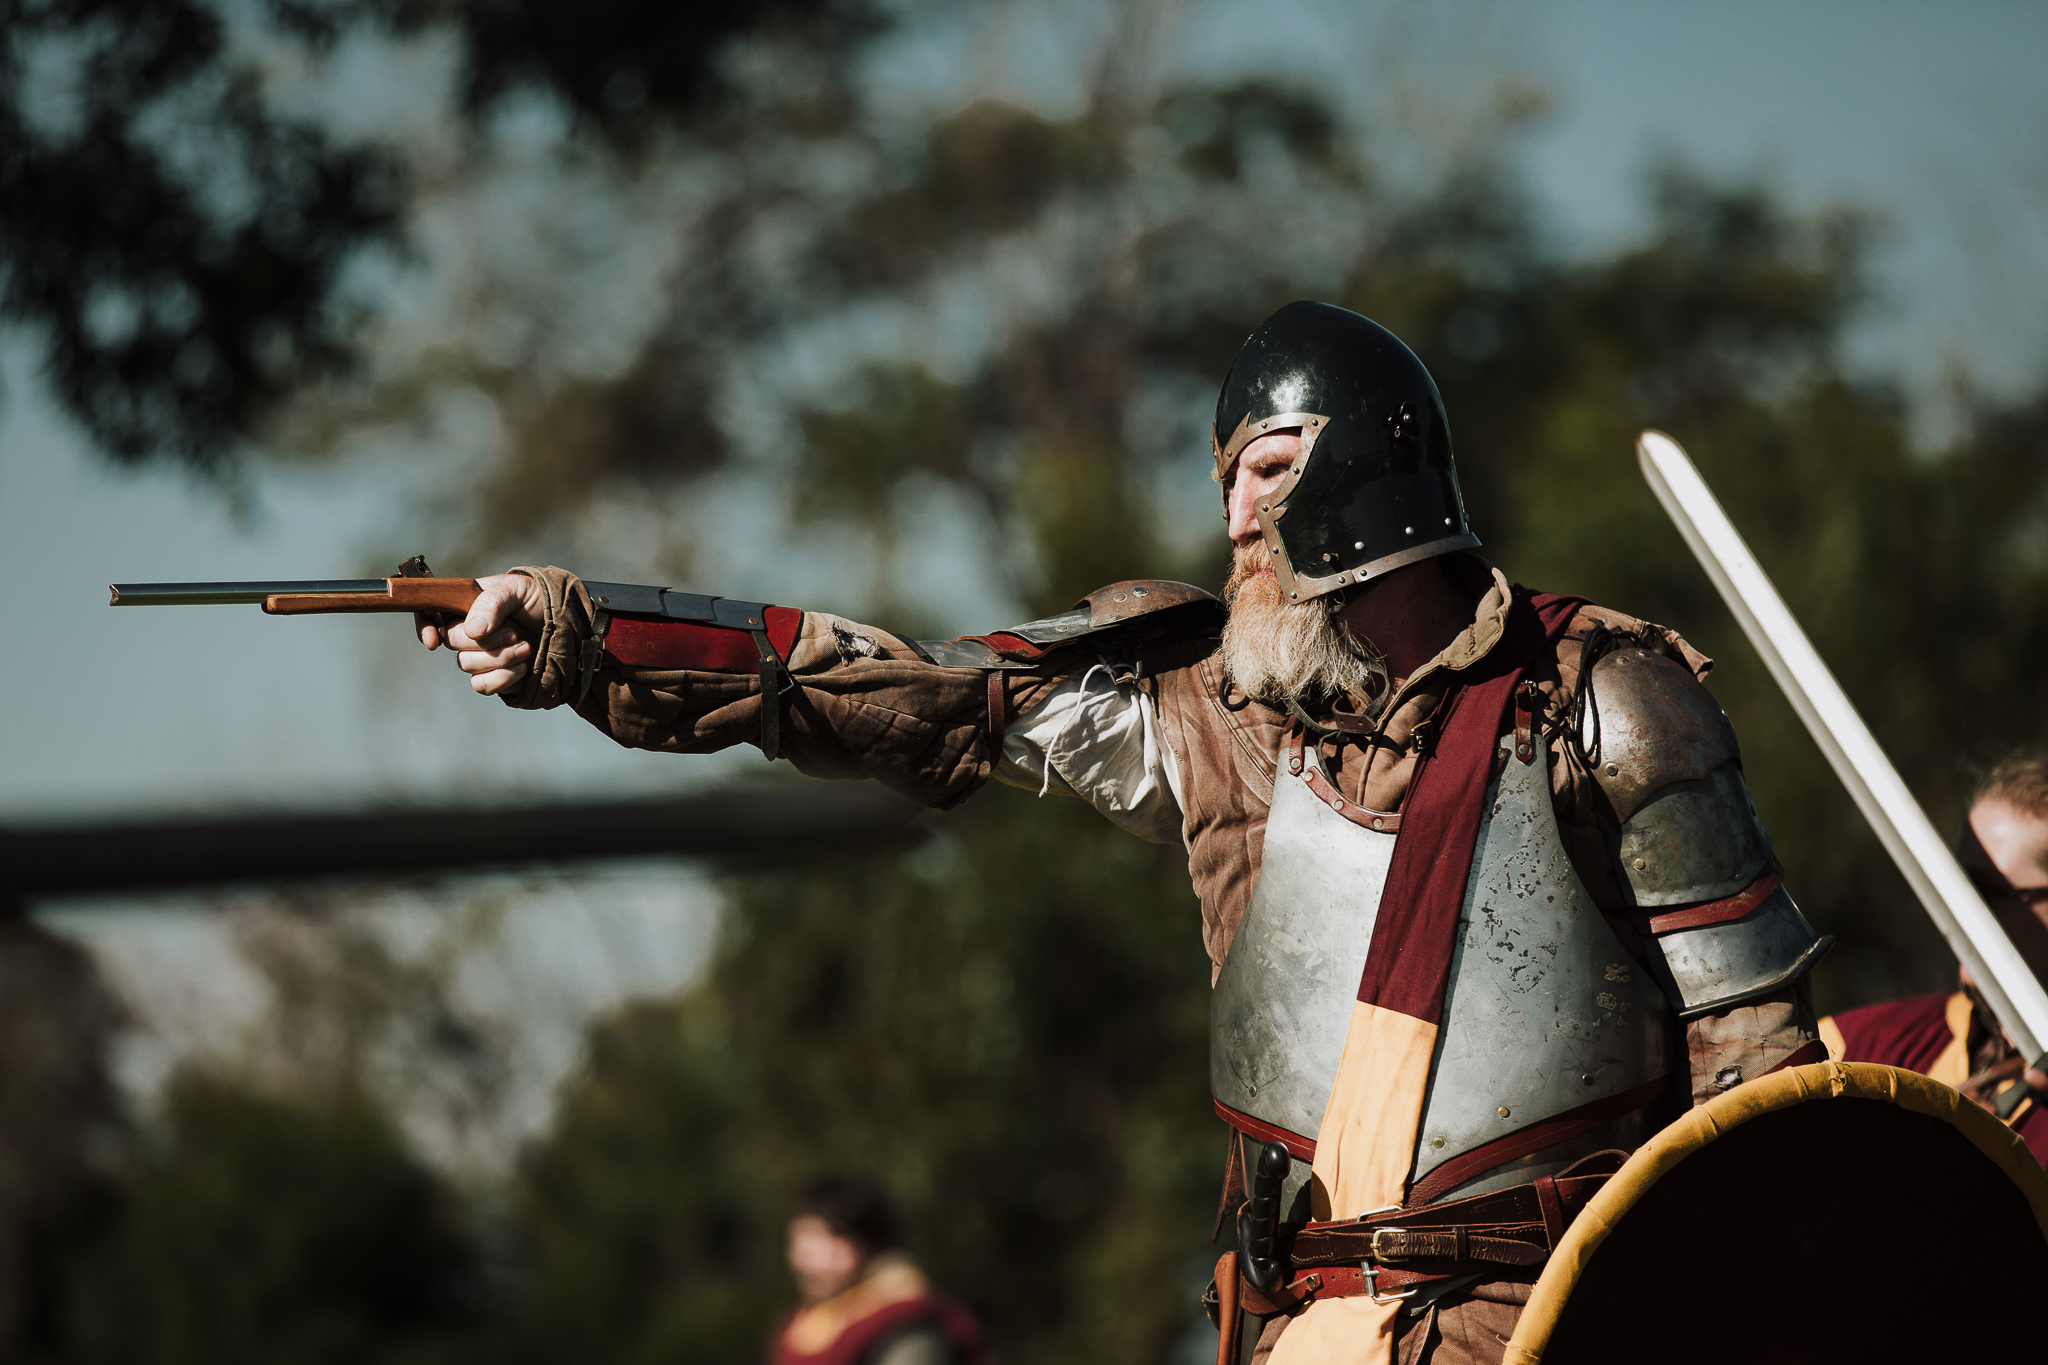 Swordcraft-1325_LR.jpg